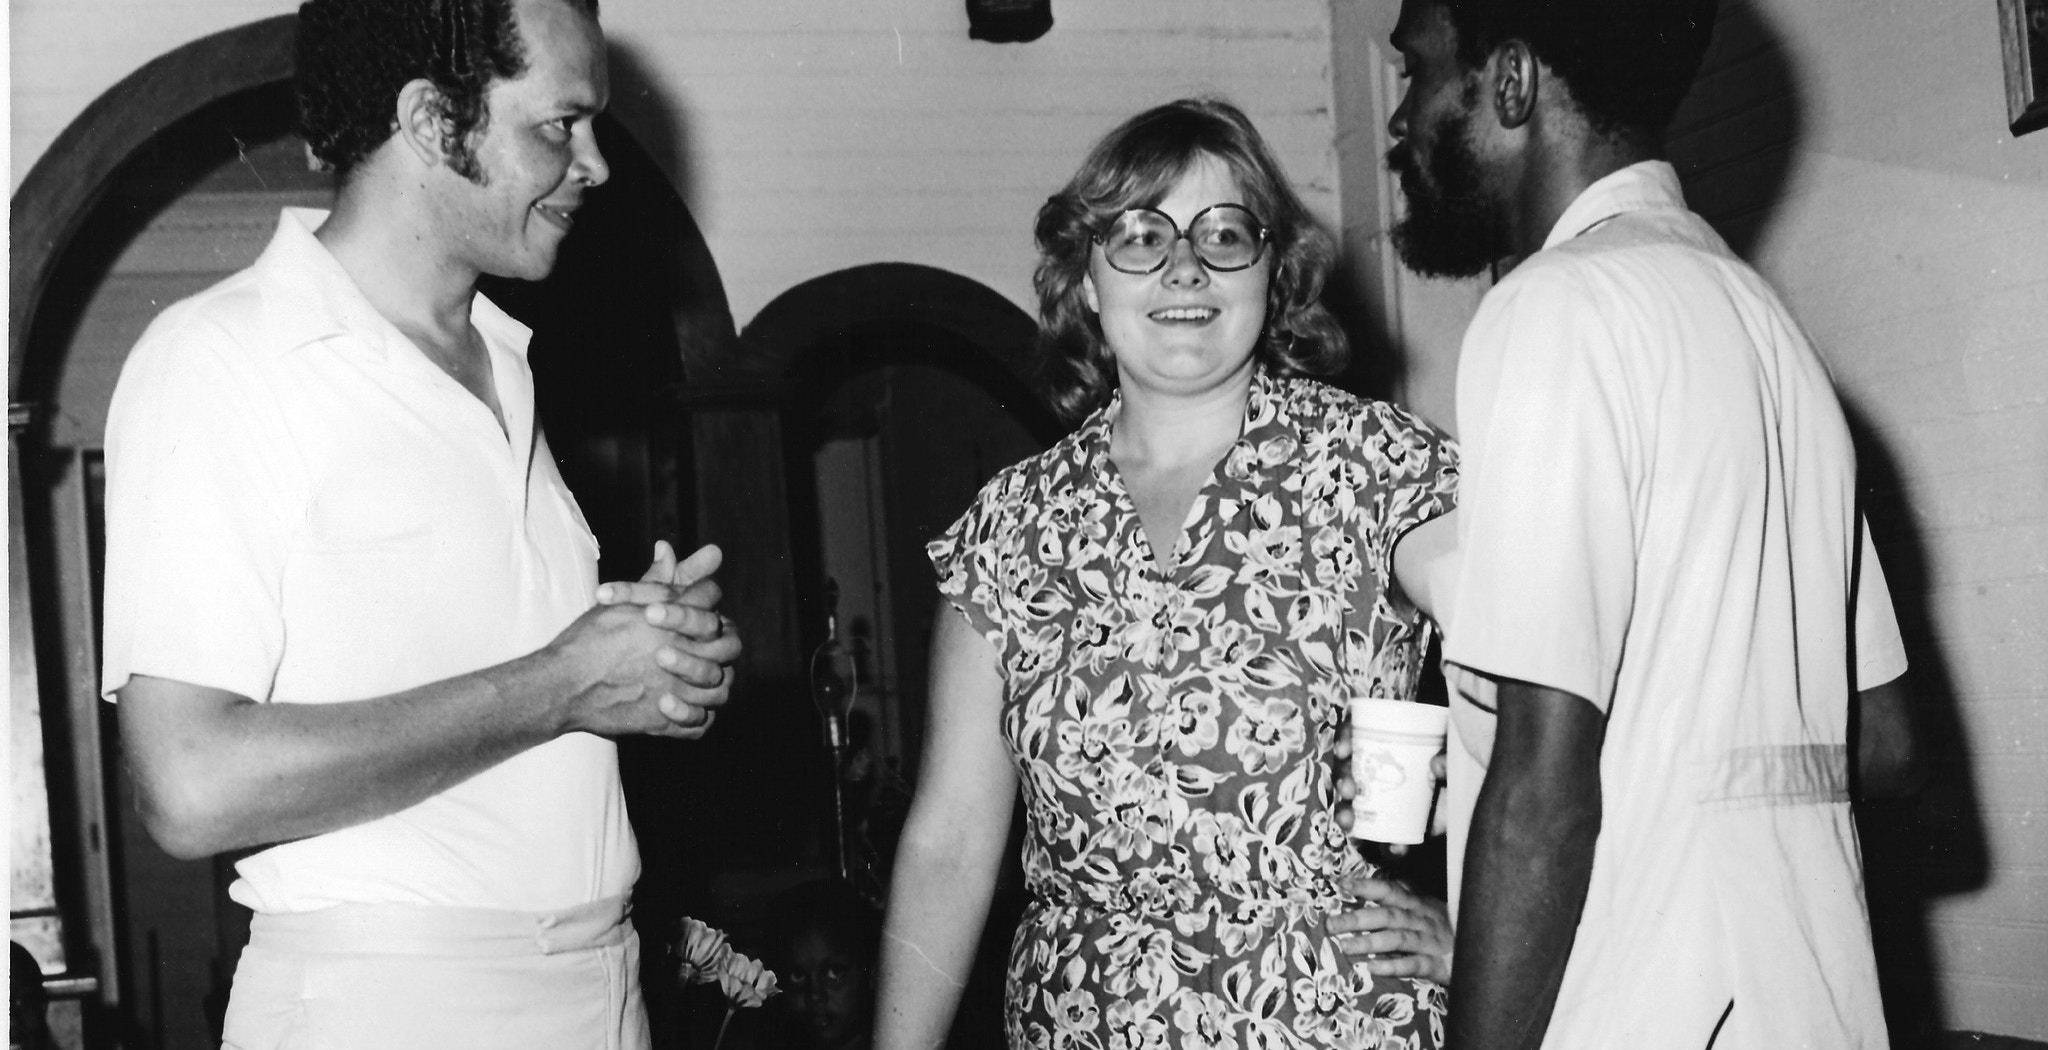 Erna Solberg Jamaica 1979